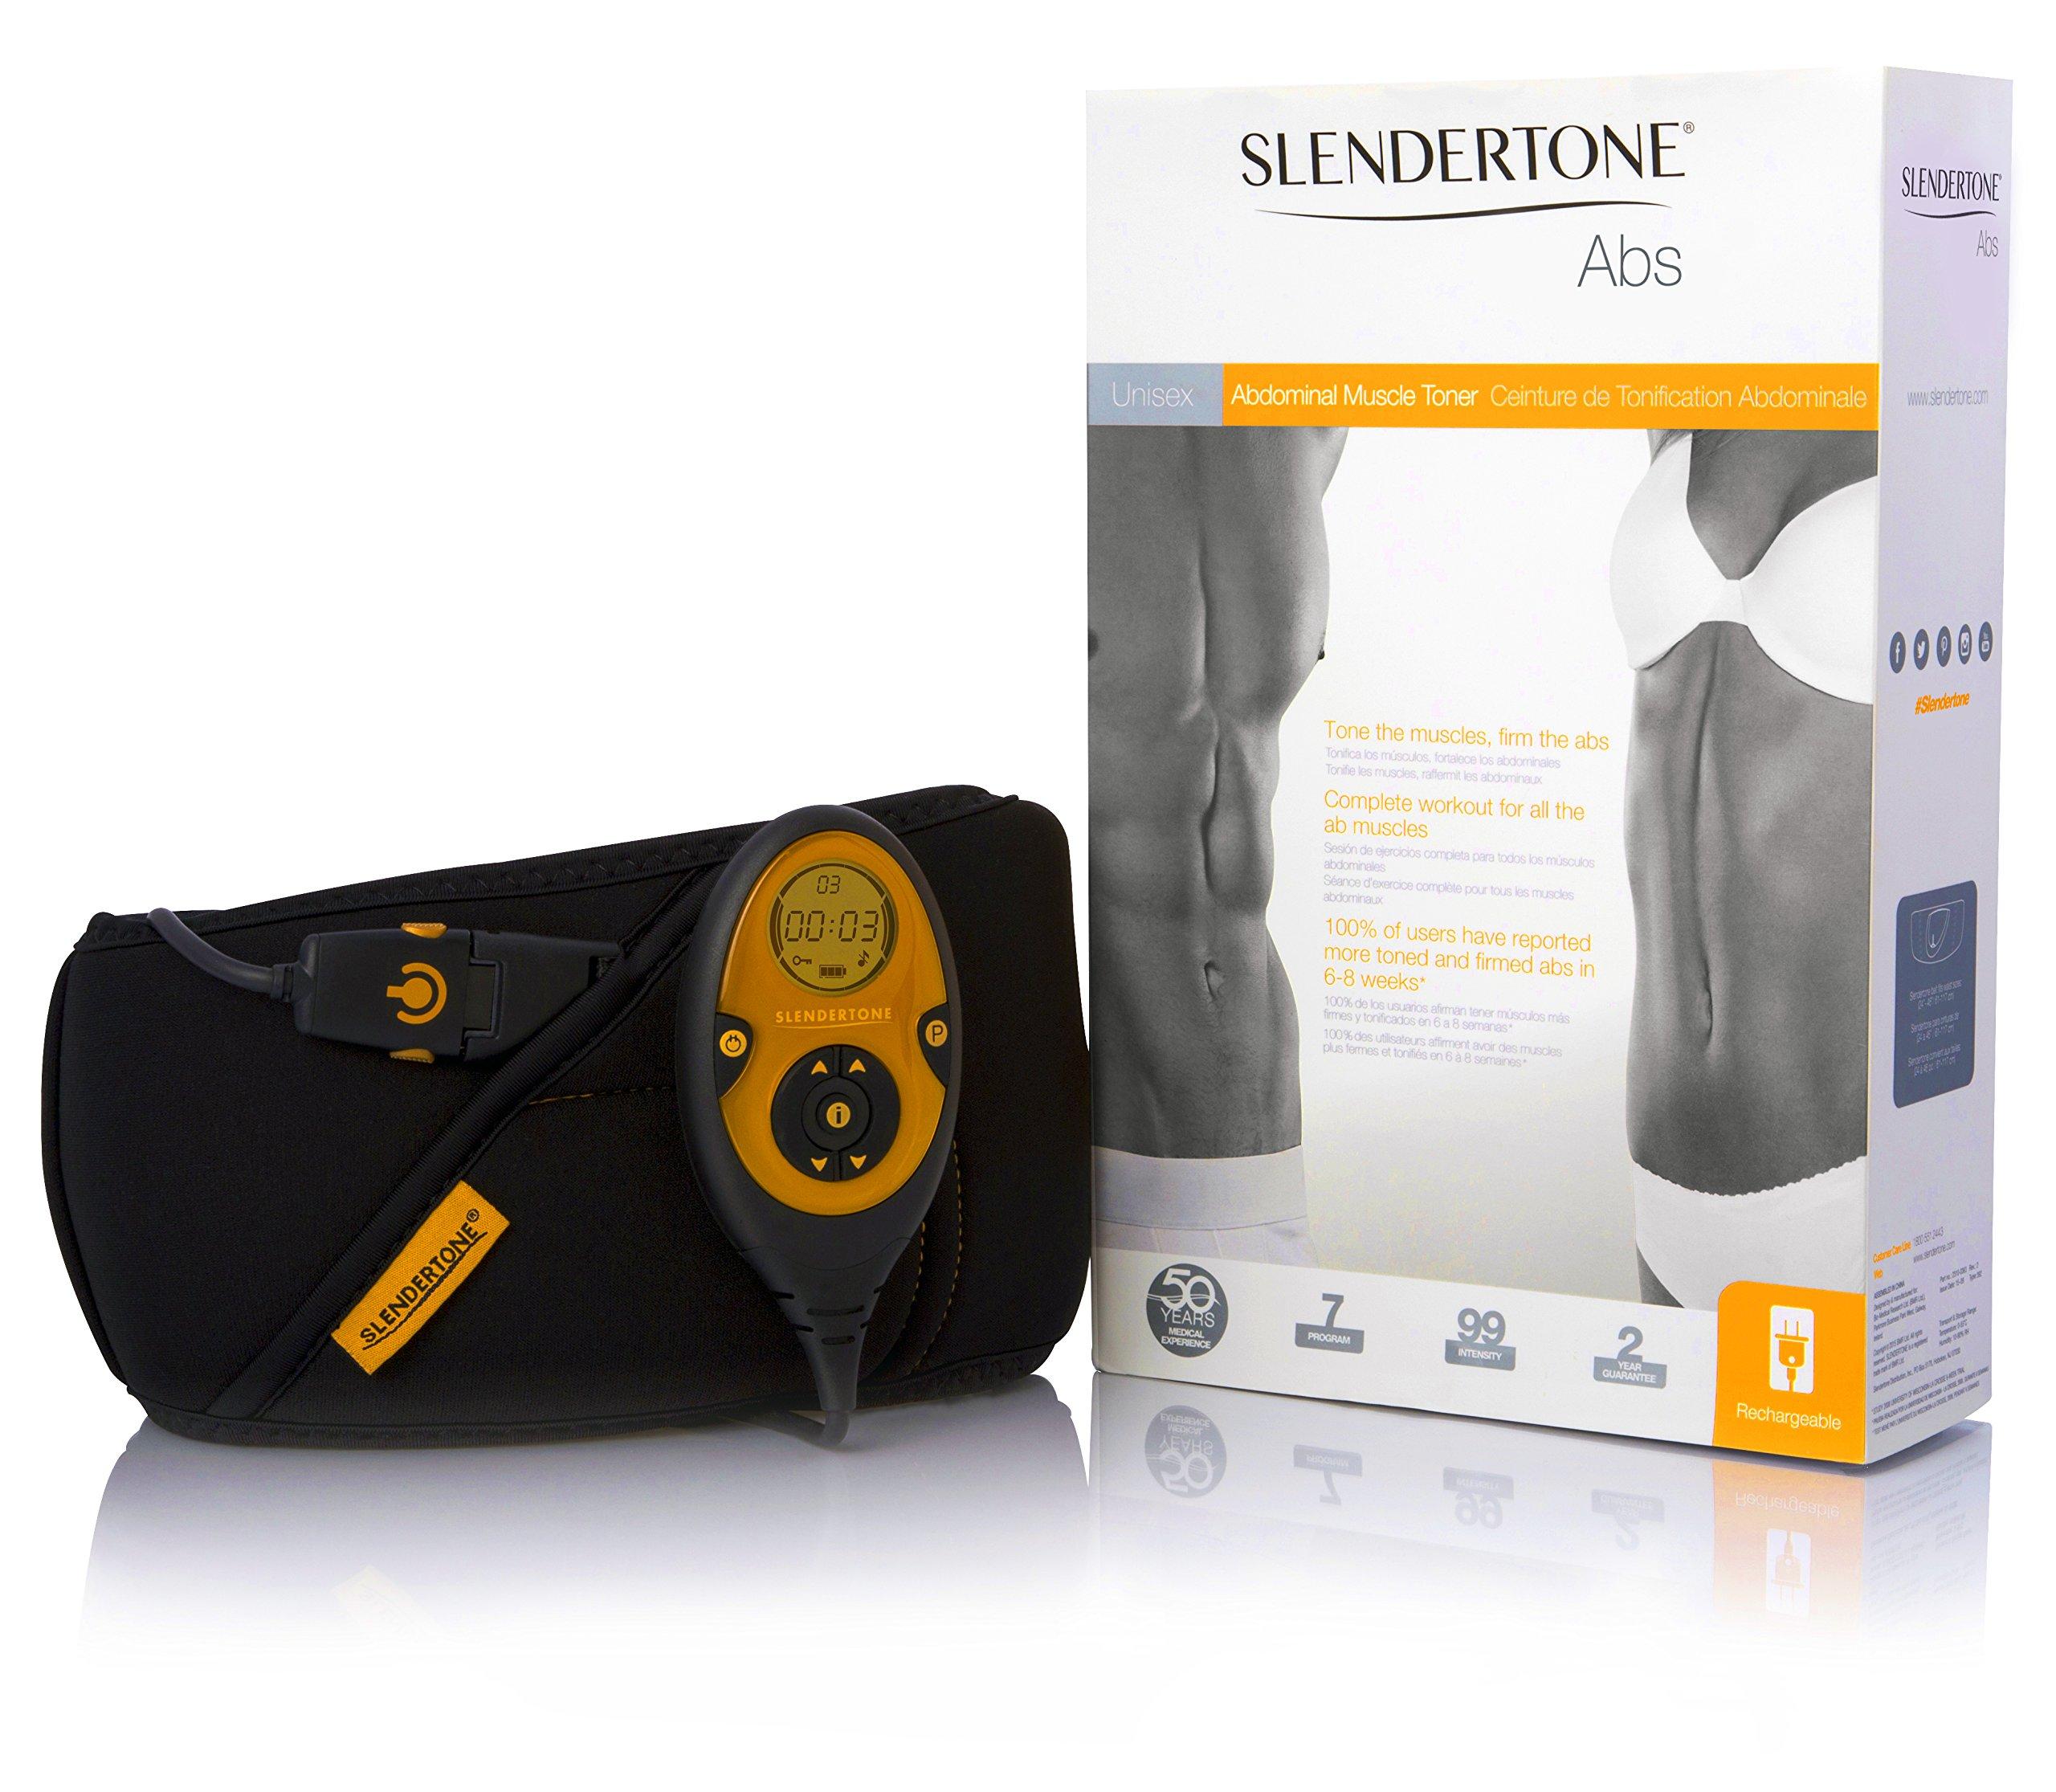 Slendertone Abs Abdominal Muscle Toner